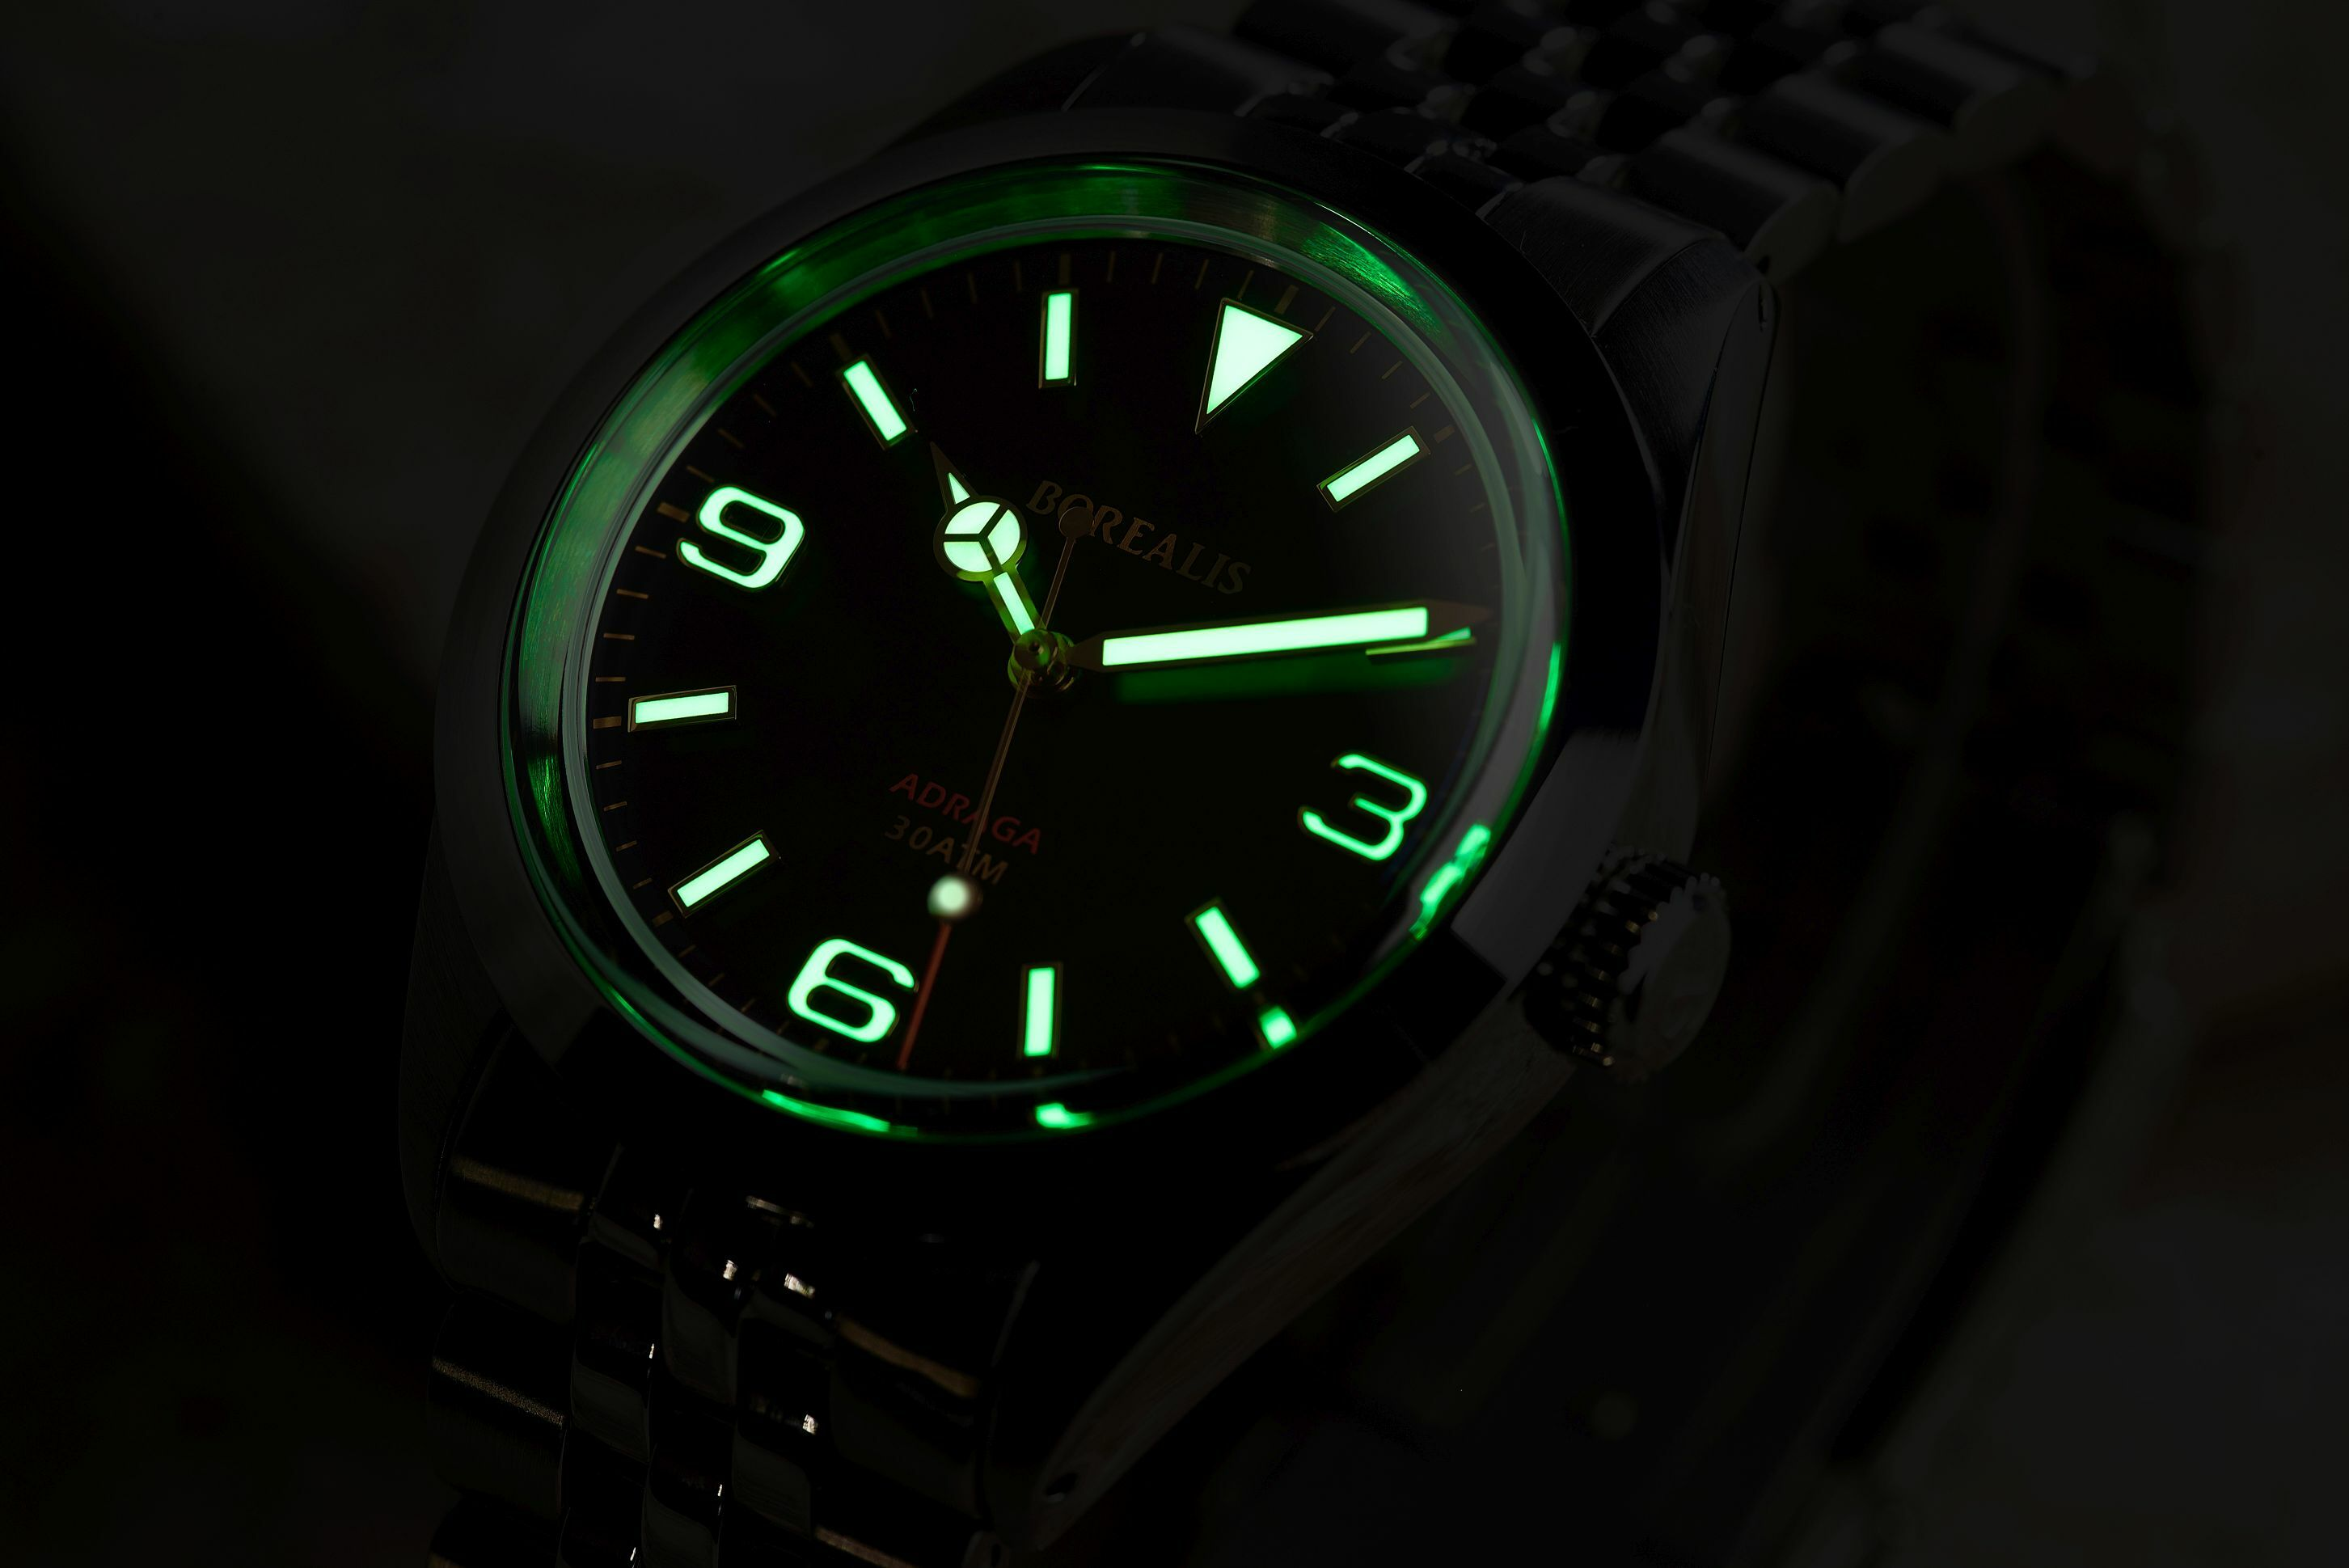 Borealis Adraga Stainless Steel Miyota 90S5 black dial Mercedes Hands No Date Old Radium X1 lume